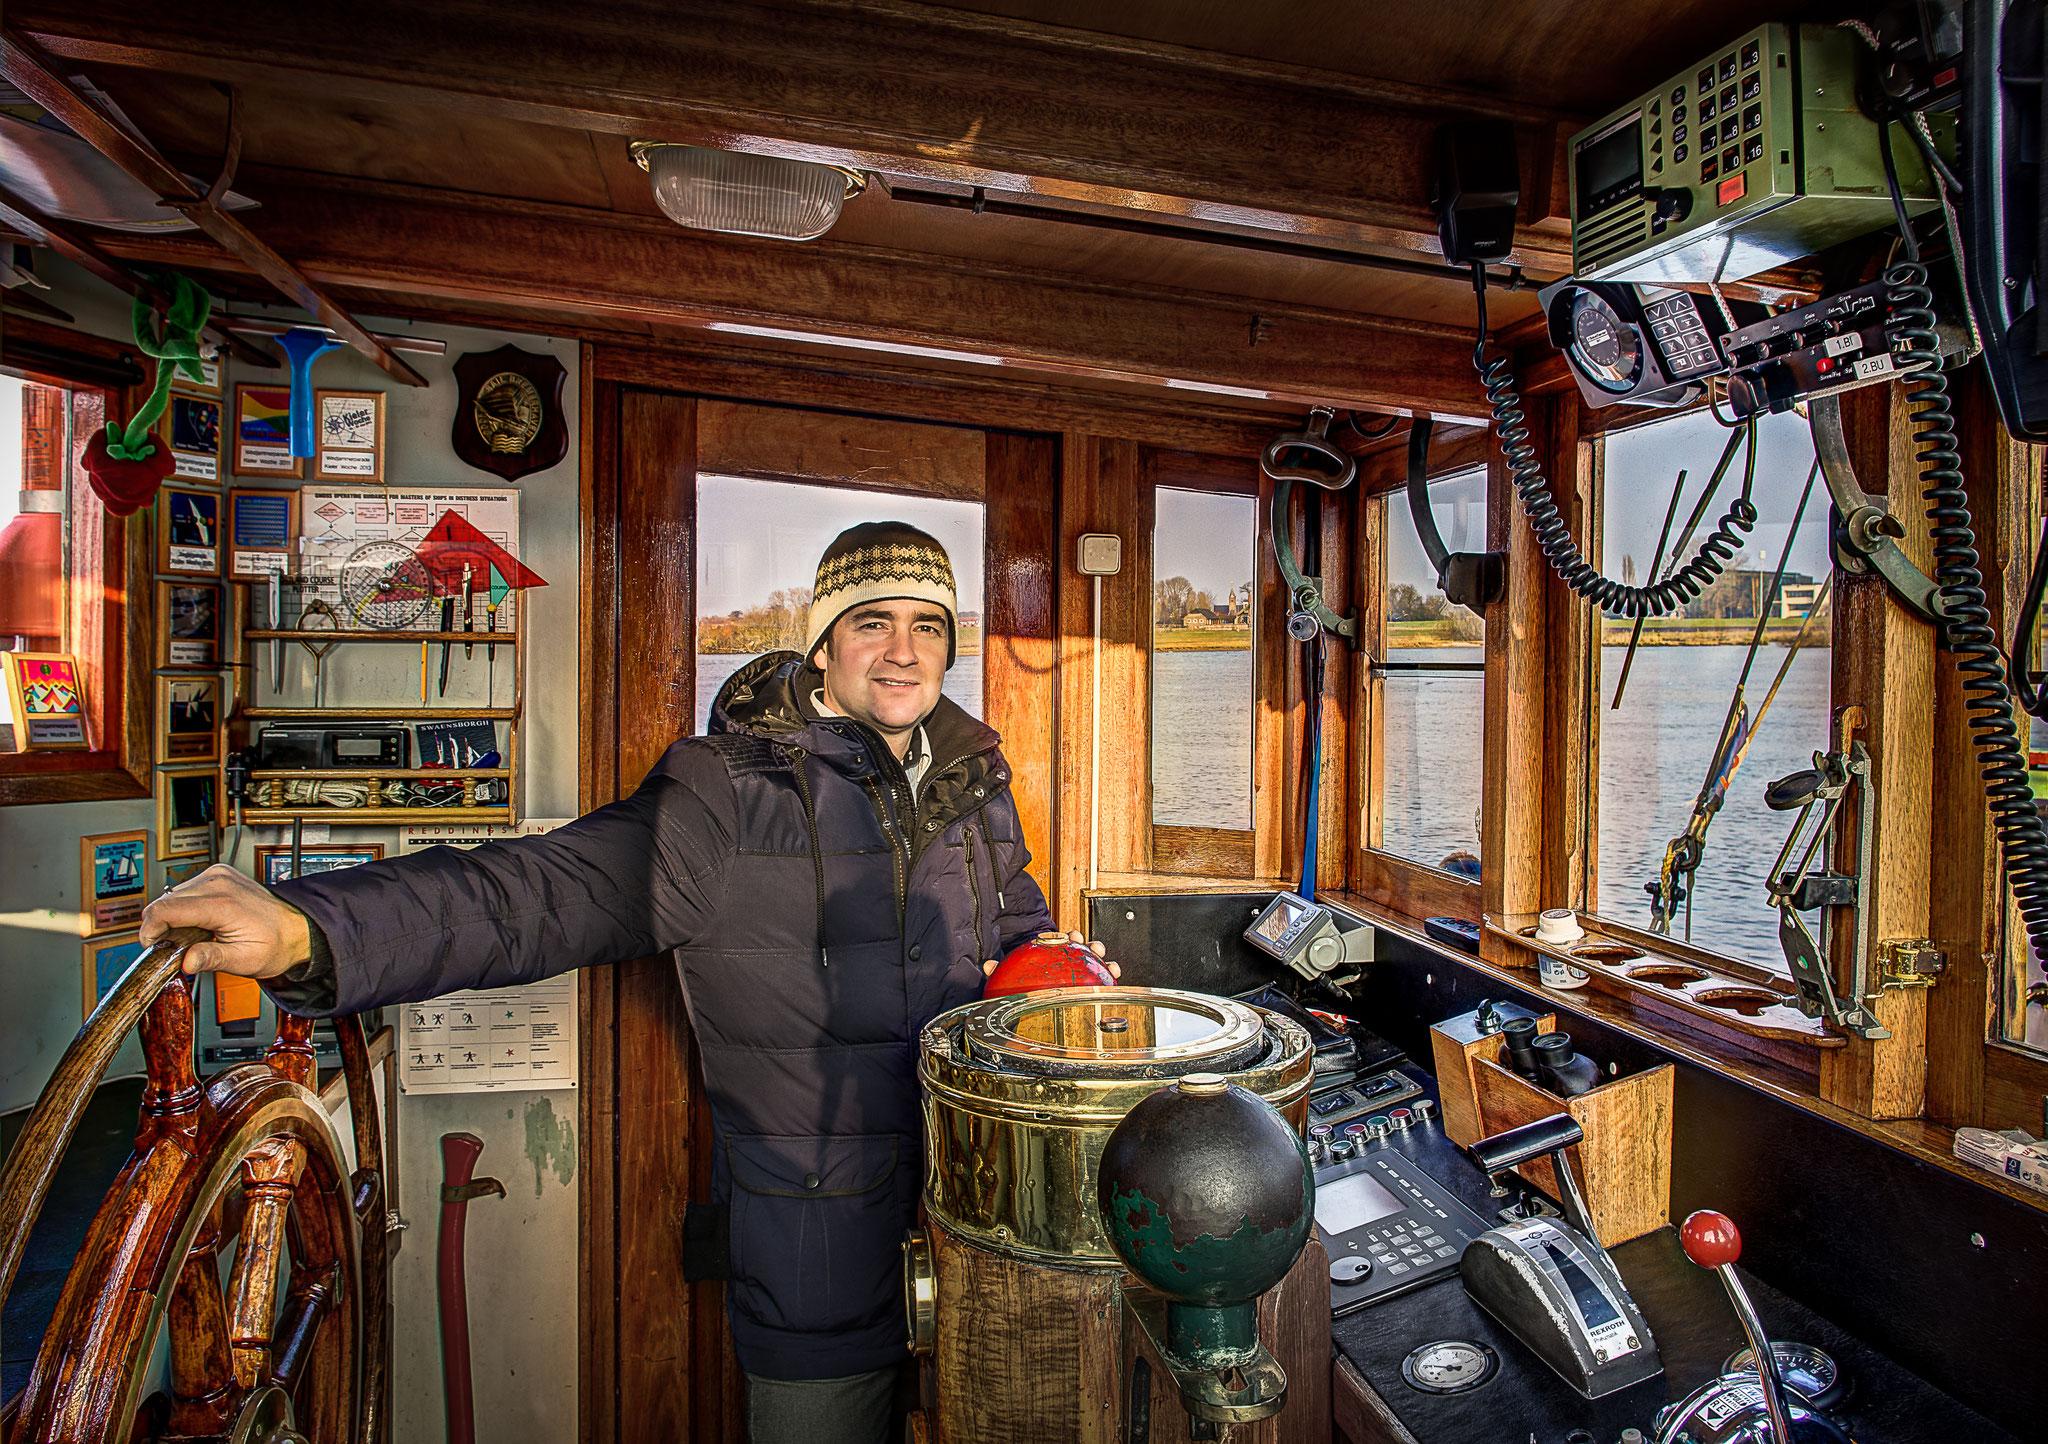 Segelschiff Swaensborgh